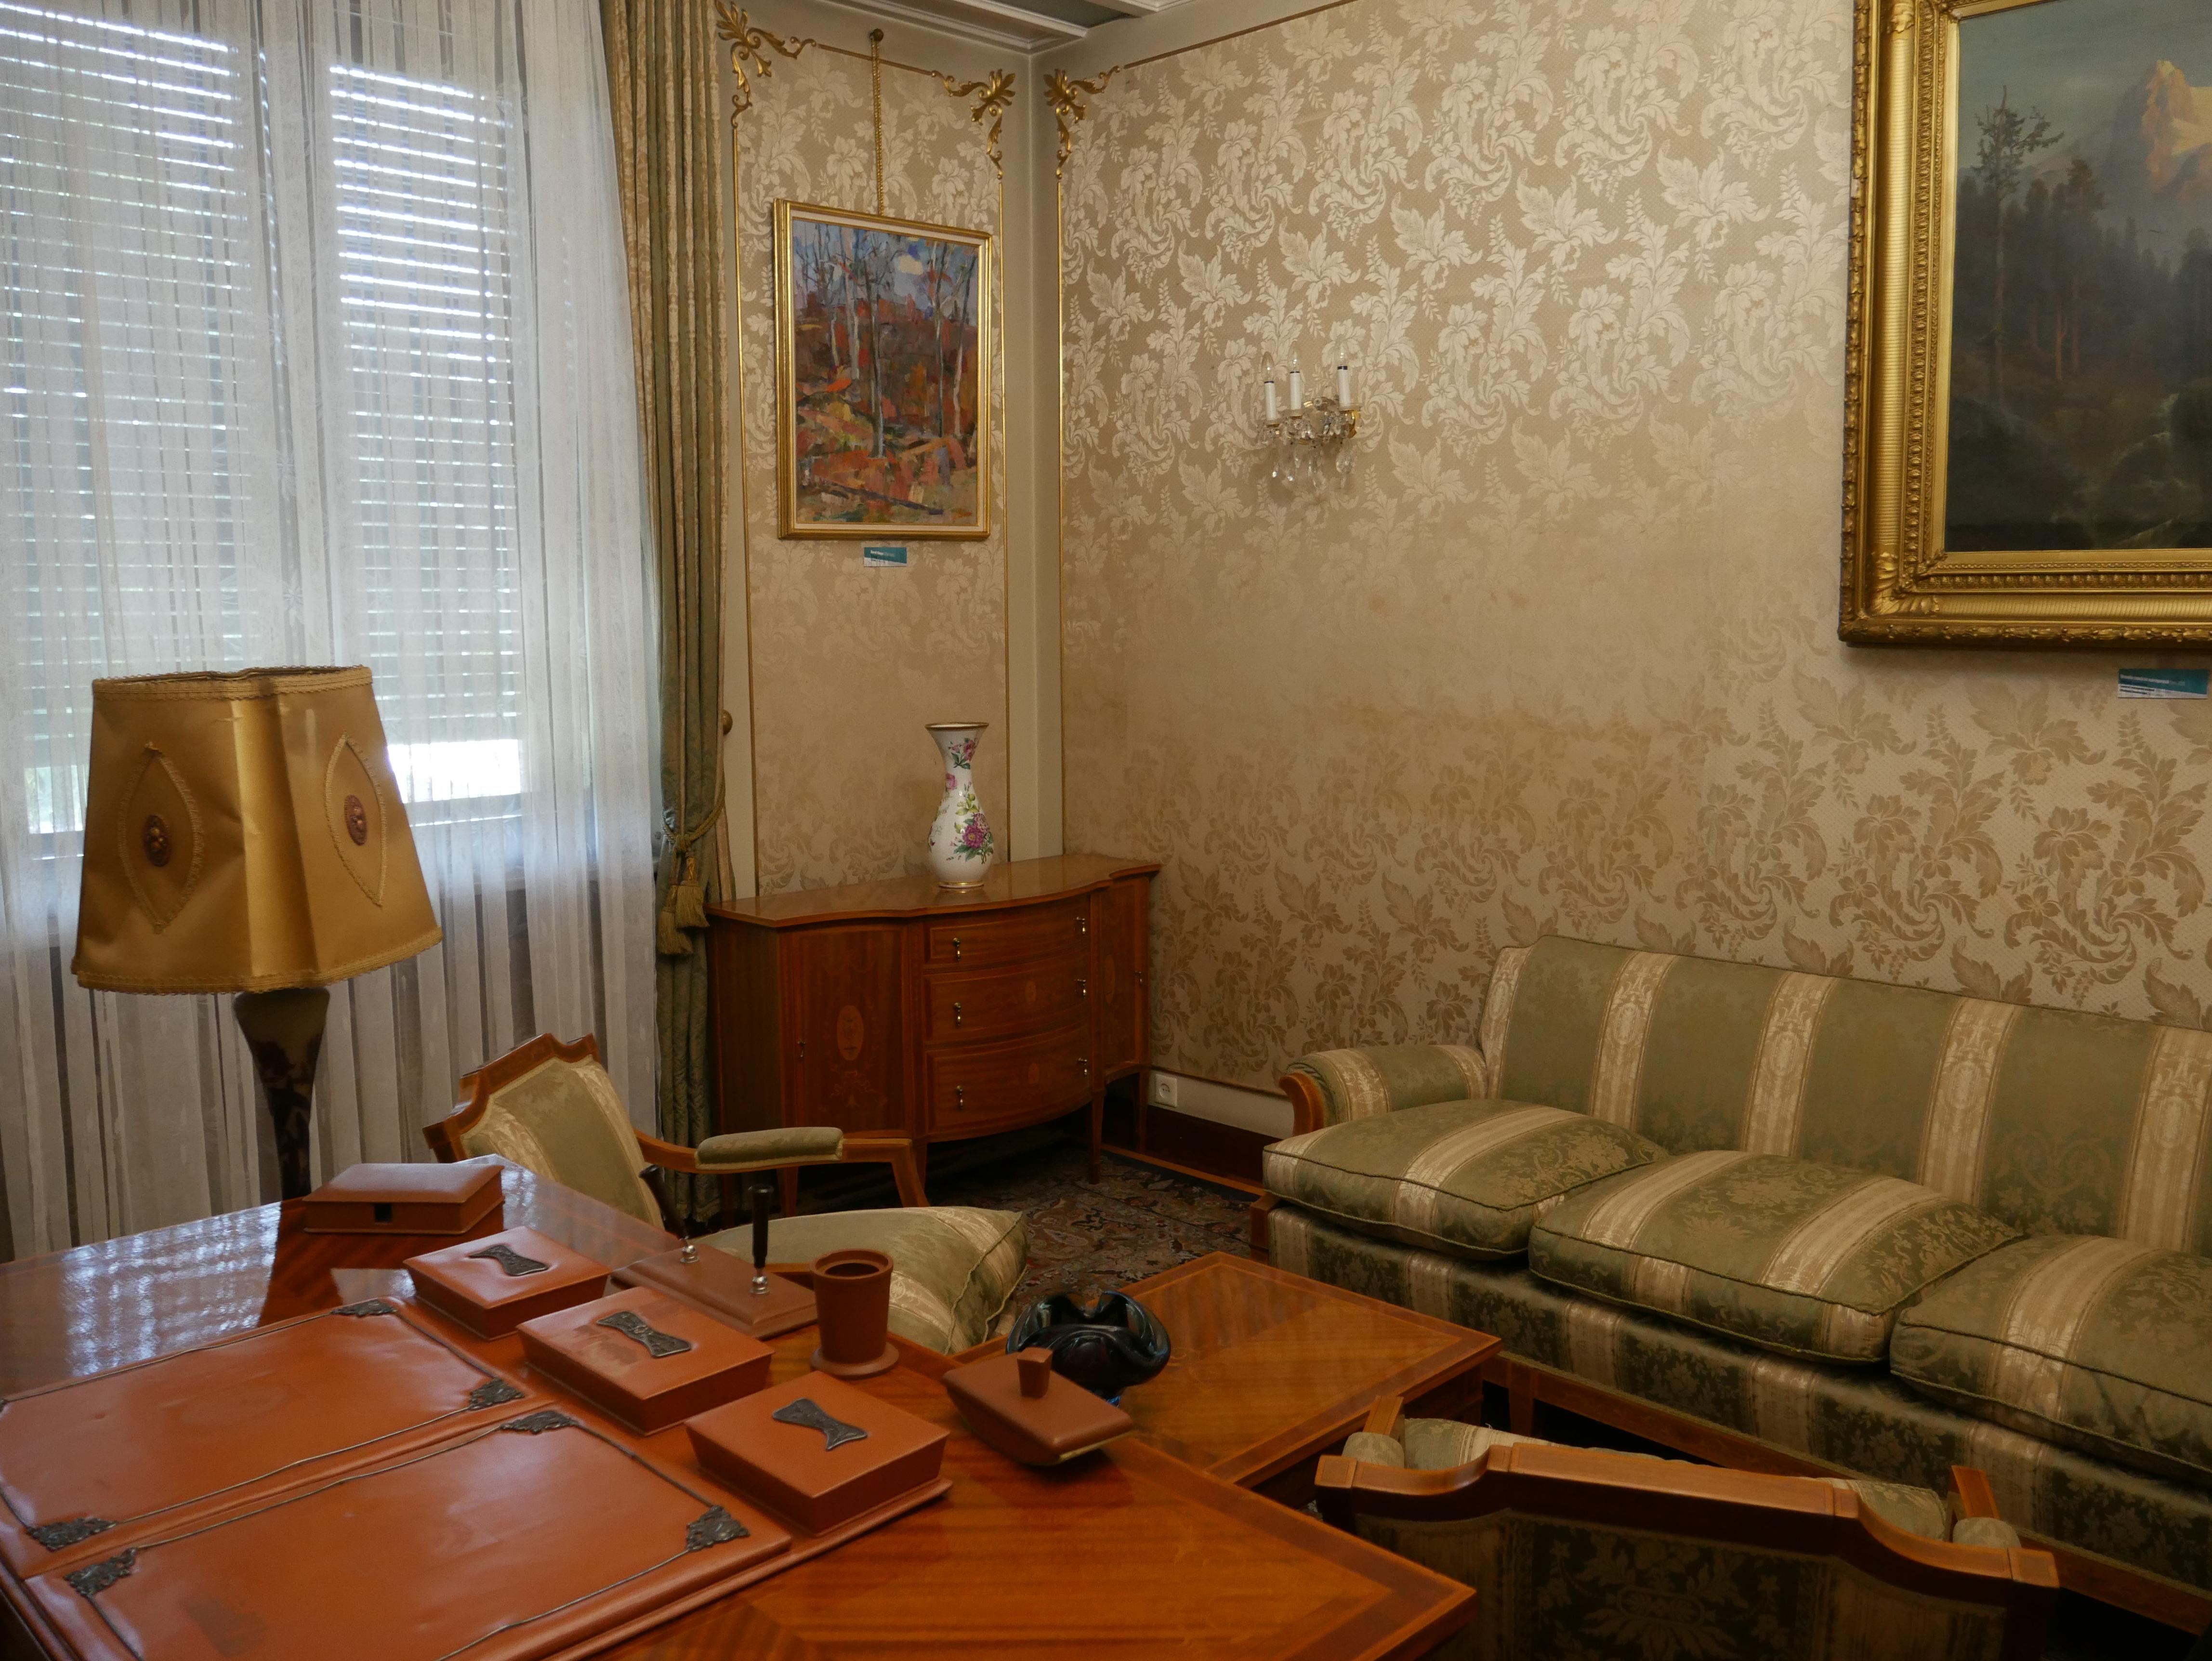 Bucarest - Palais du Printemps - Appartement de Nicu Ceausescu